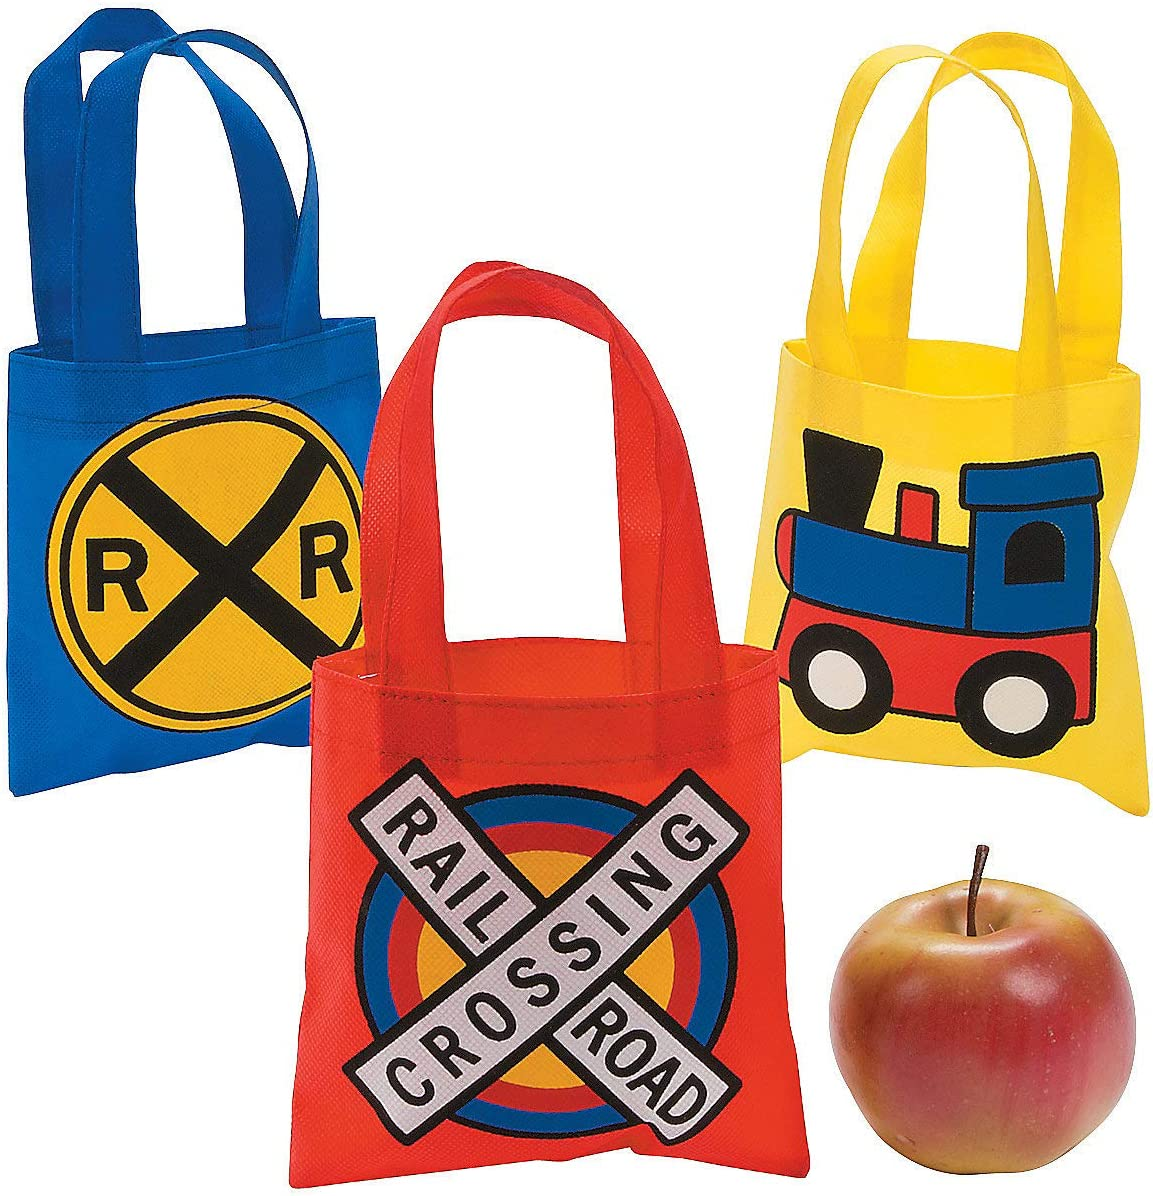 Medium Train Tote bag Book bag|Custom train tote|Train toy tote Personalized Train tote|Library tote|Boys Preschool tote|Train Party theme